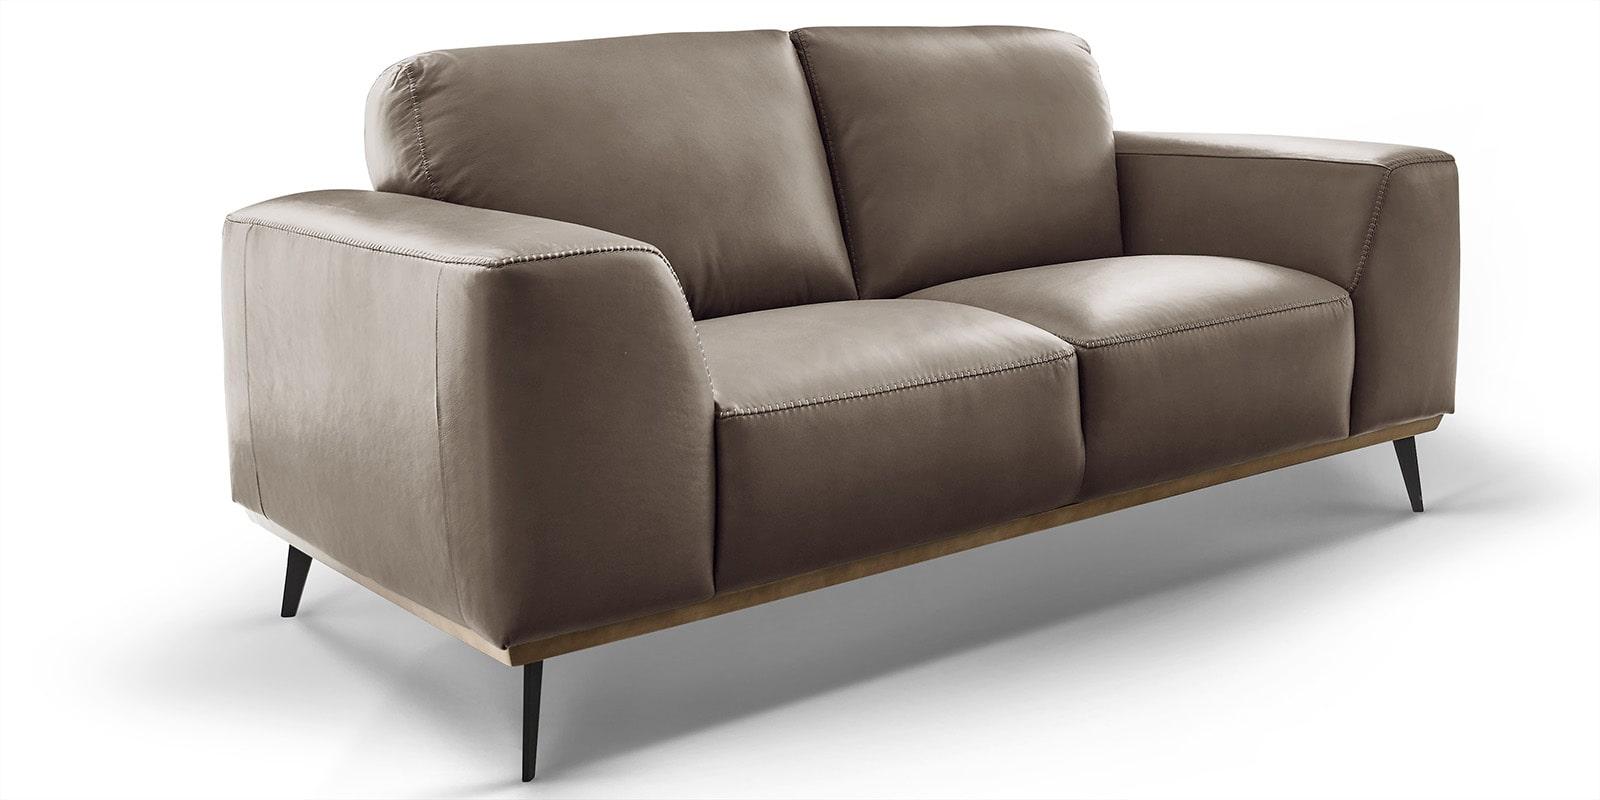 Moebella24 - 2-Sitzer - Sofa - Barcelona - Leder - Taupe - Skandinavisches - Design - Punto - cavallo - Nähte - Detailaufnahme